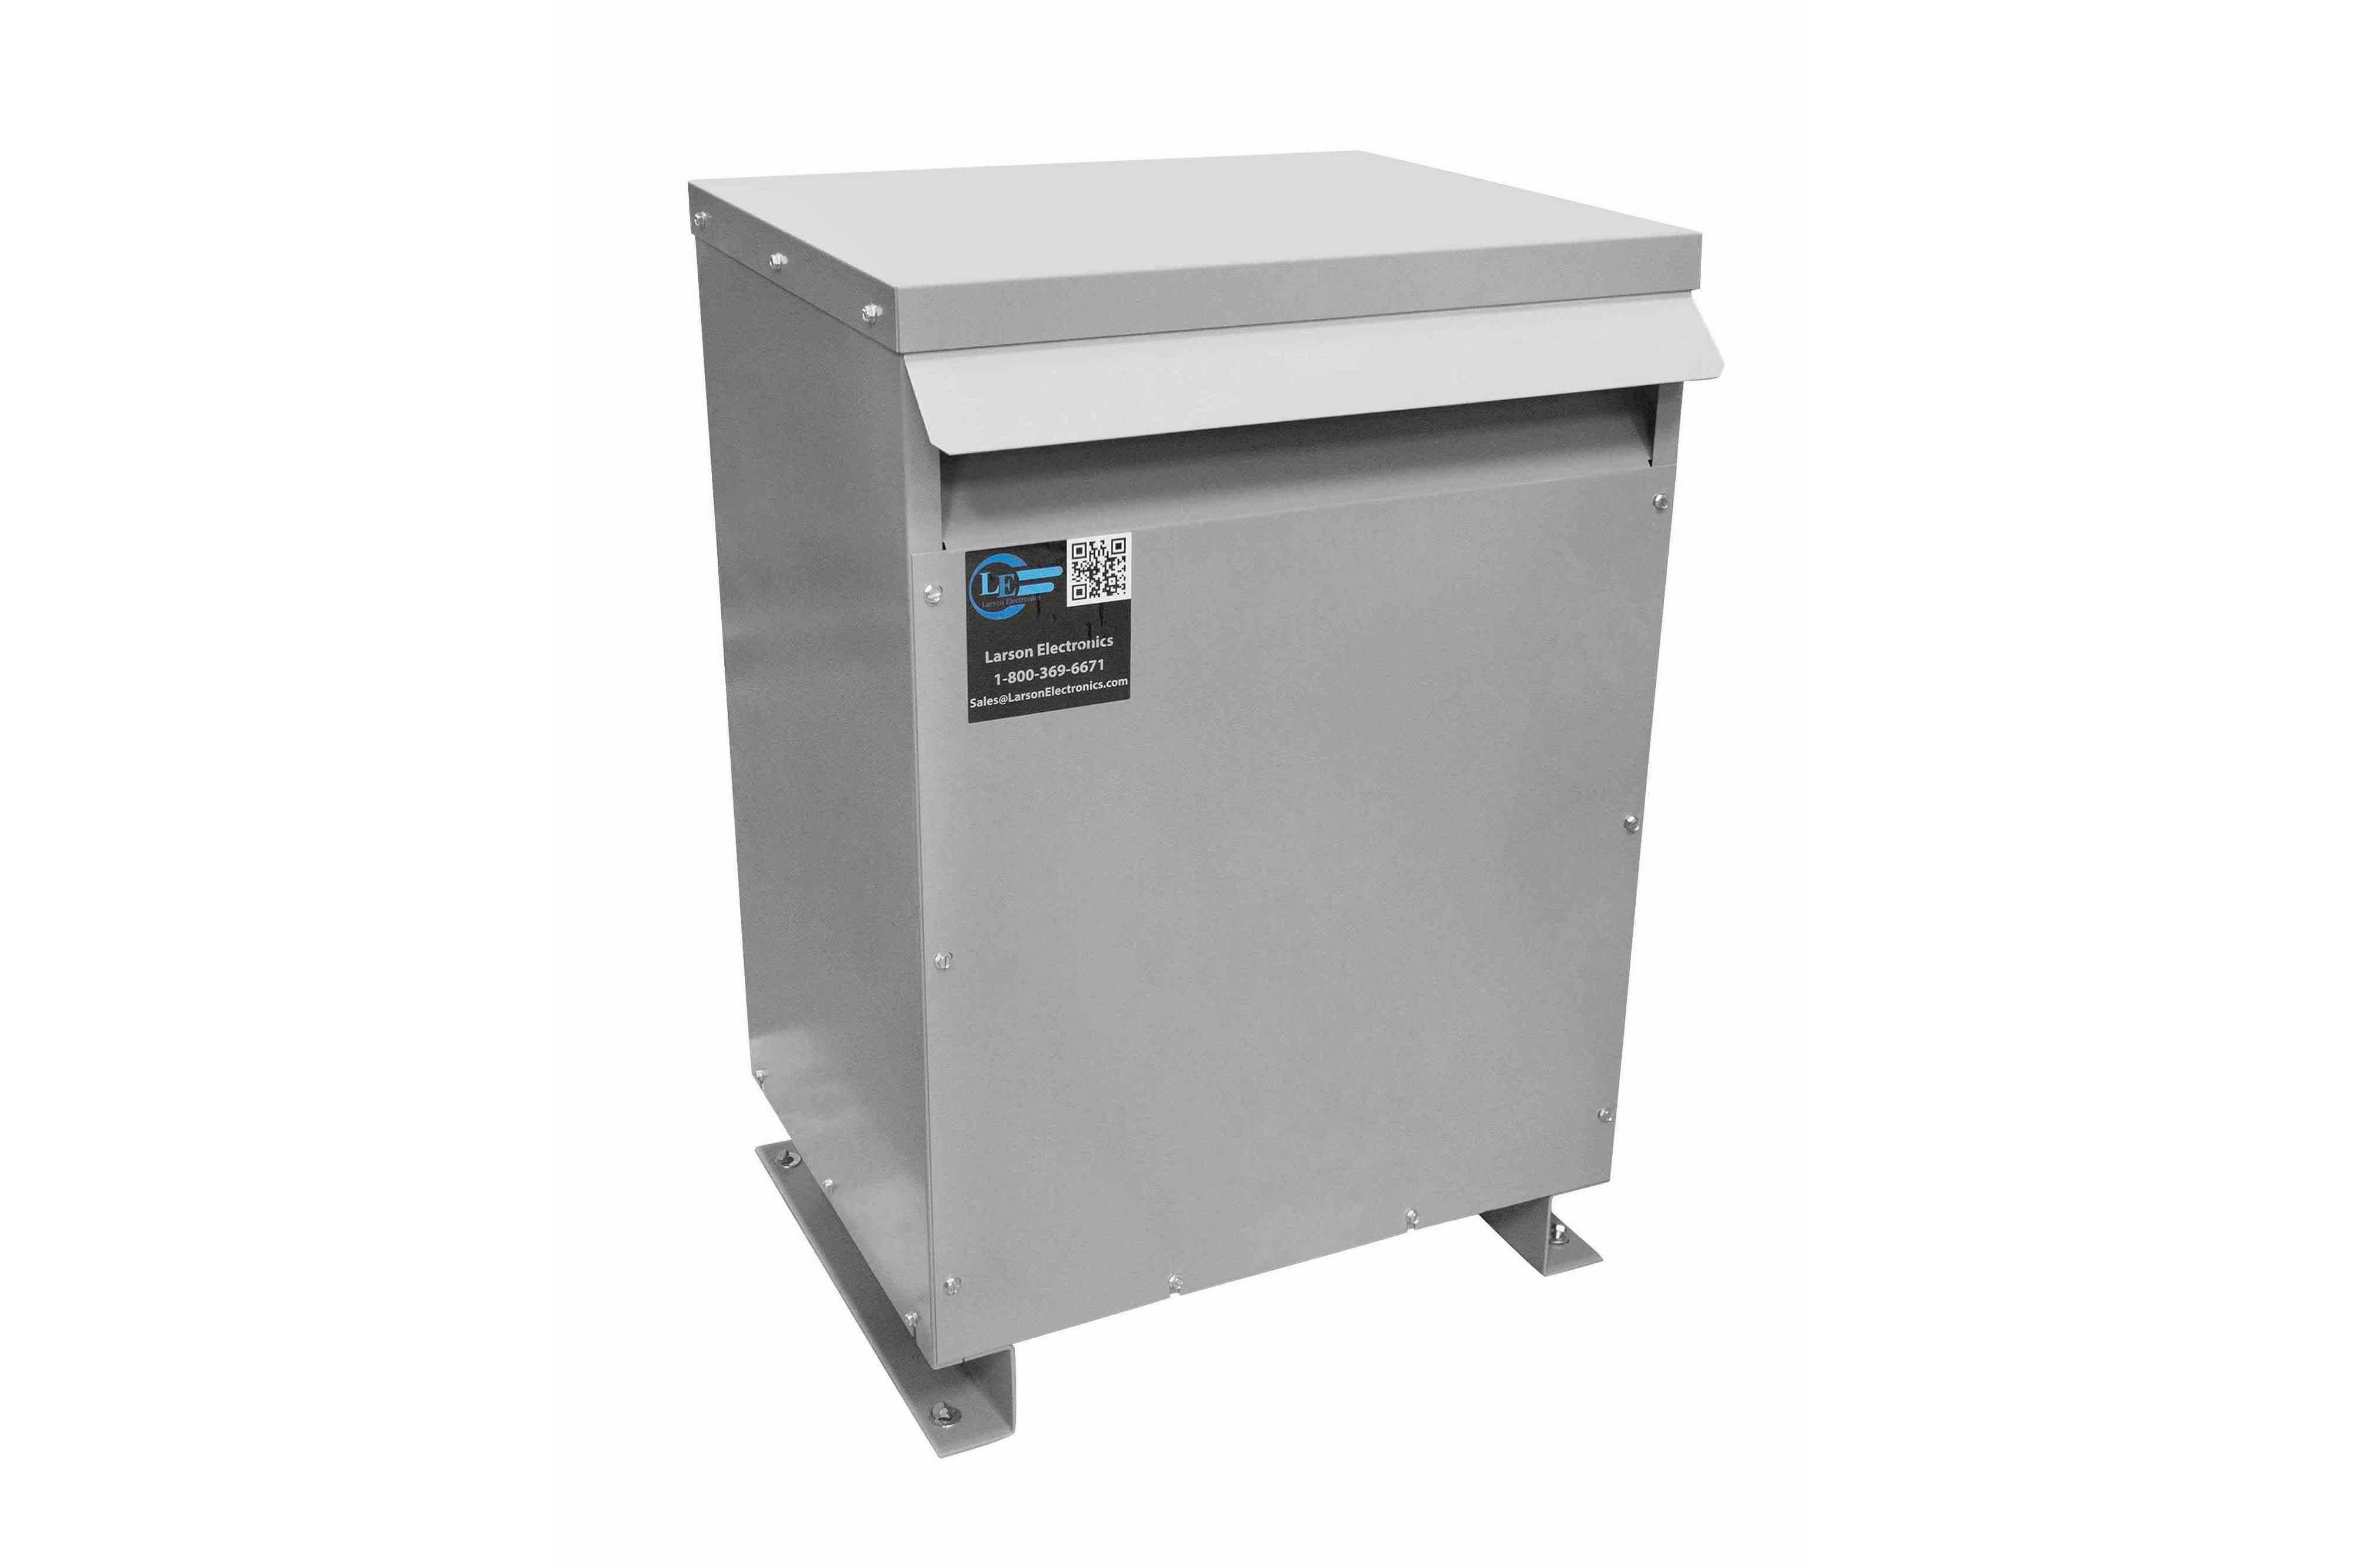 300 kVA 3PH Isolation Transformer, 600V Wye Primary, 480Y/277 Wye-N Secondary, N3R, Ventilated, 60 Hz